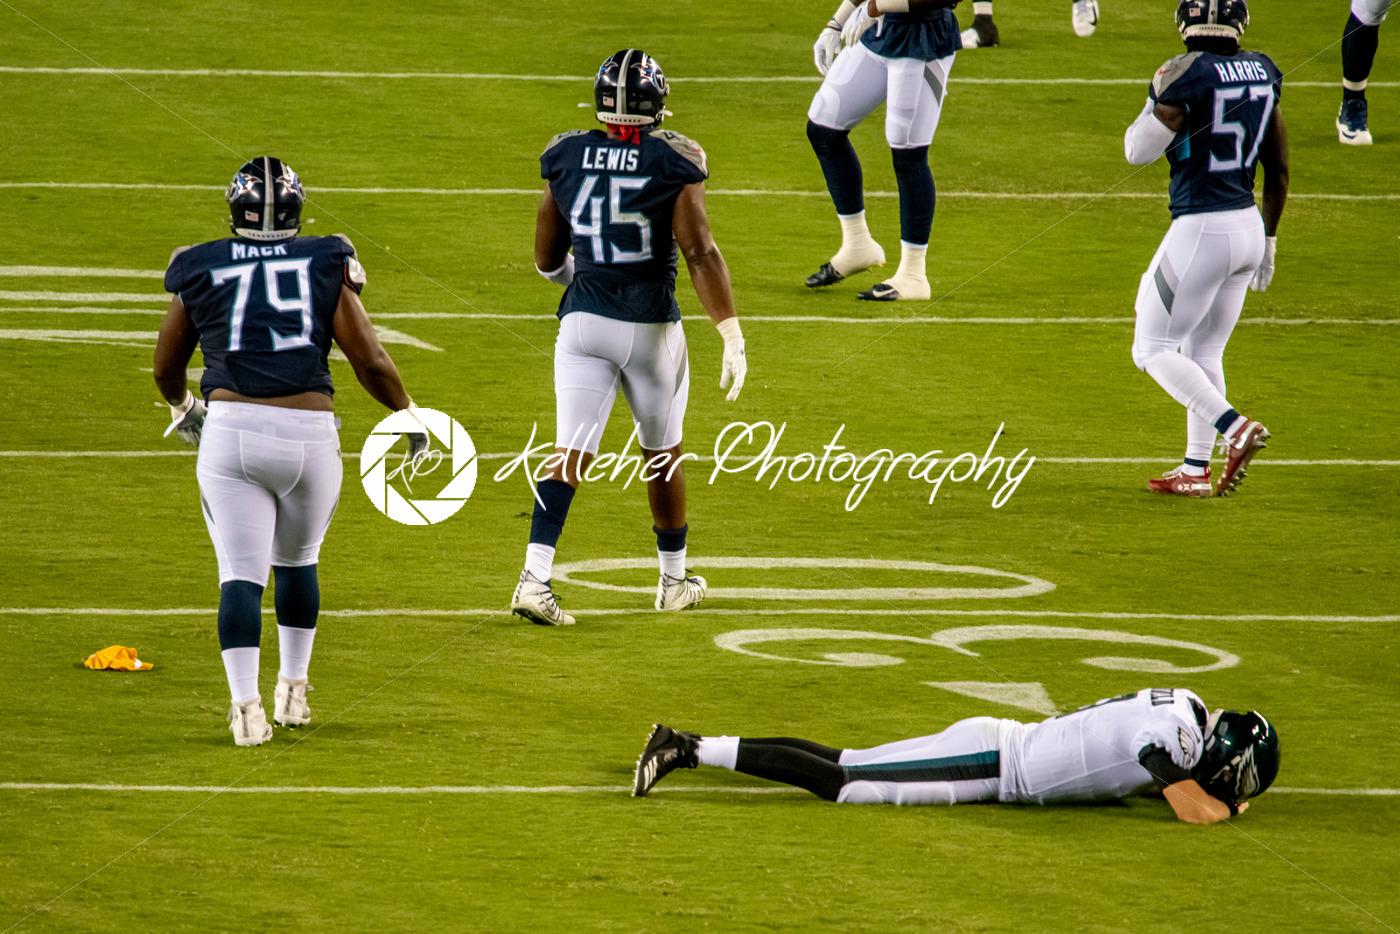 Philadelphia, PA – August 8, 2019: Philadelphia Eagles backup Quaterback Nate Sudfeld is injured - Kelleher Photography Store